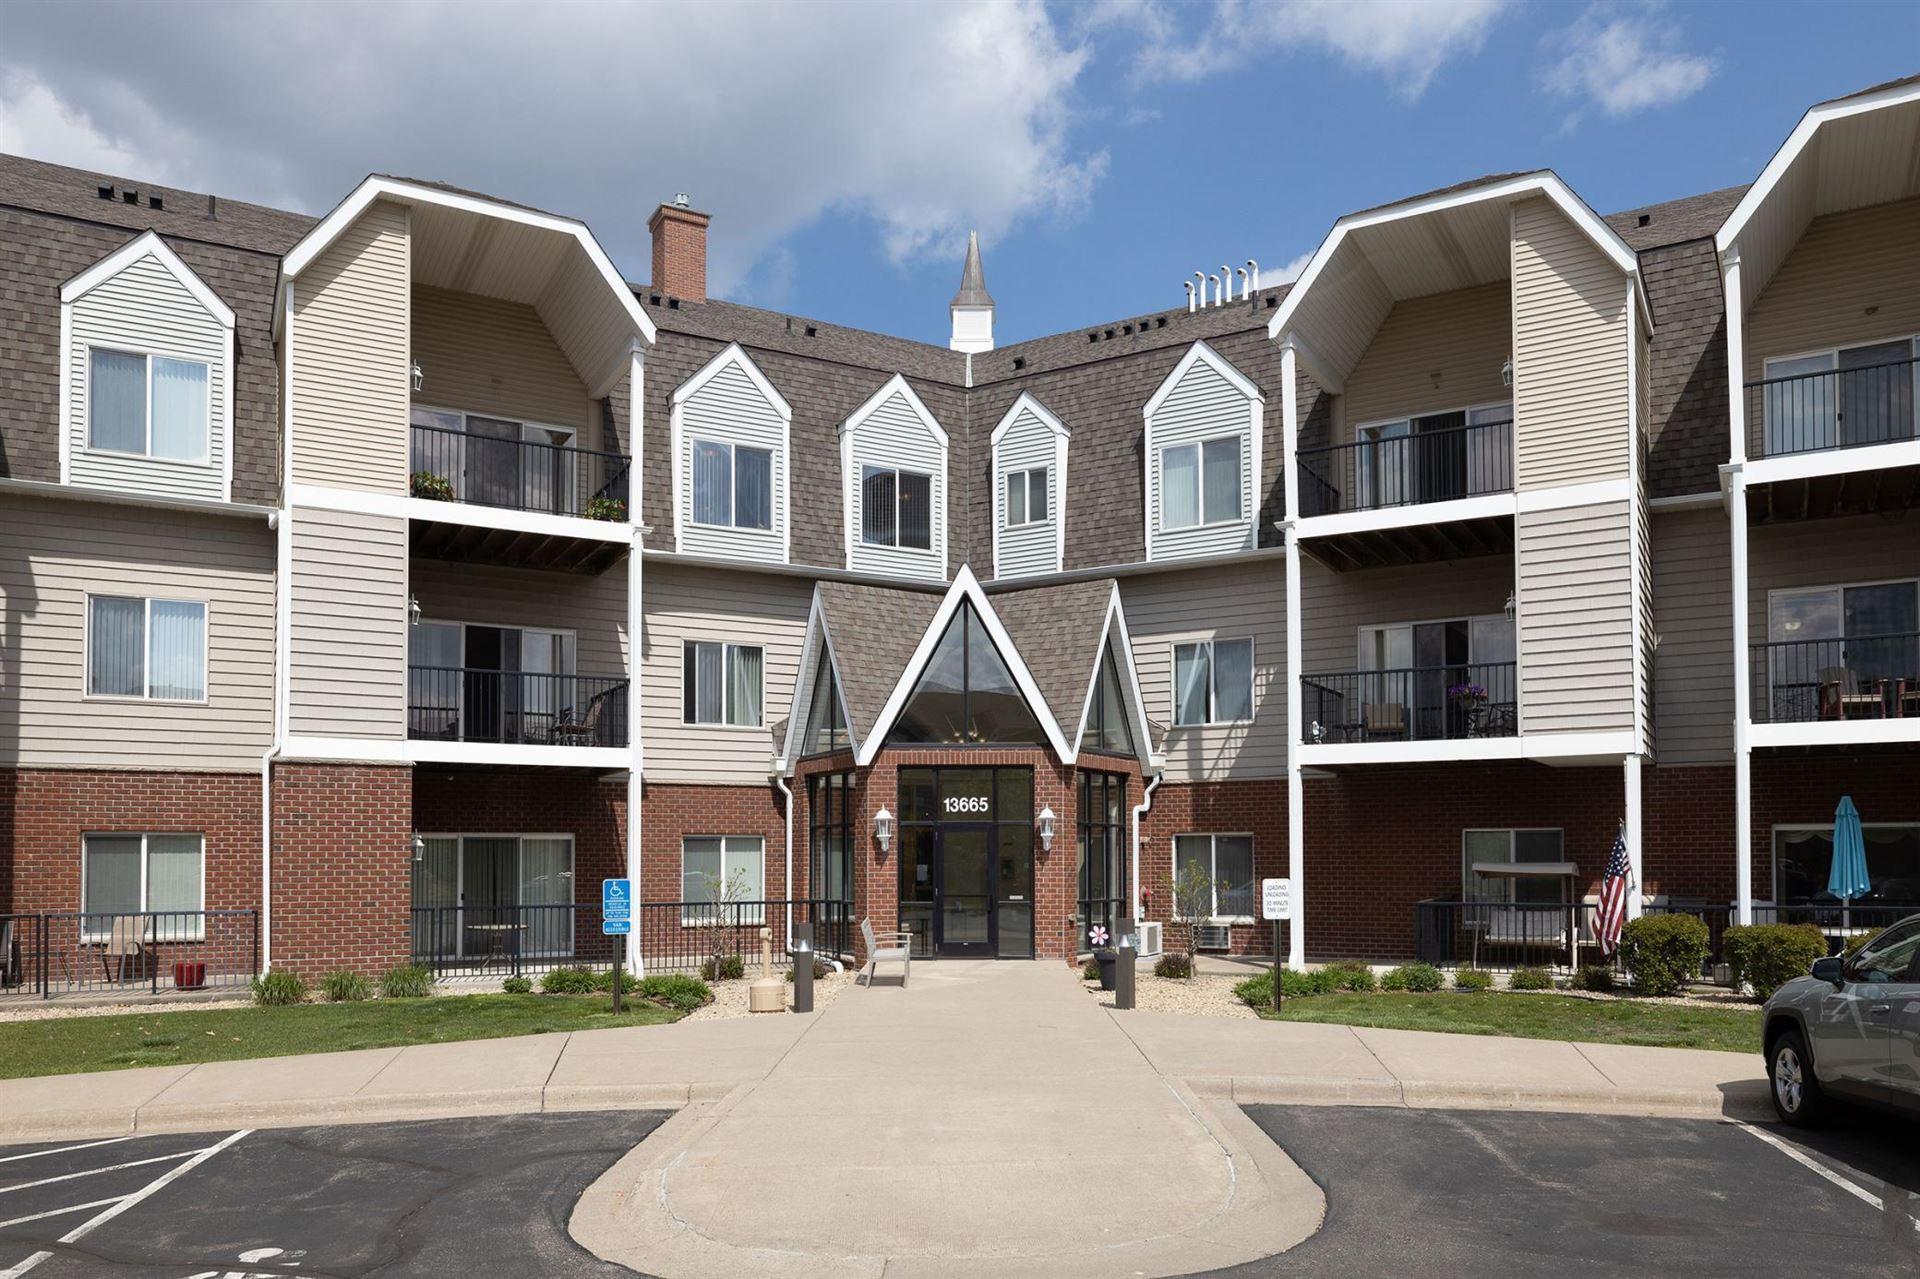 Photo of 13665 Carrach Avenue #357, Rosemount, MN 55068 (MLS # 5753982)